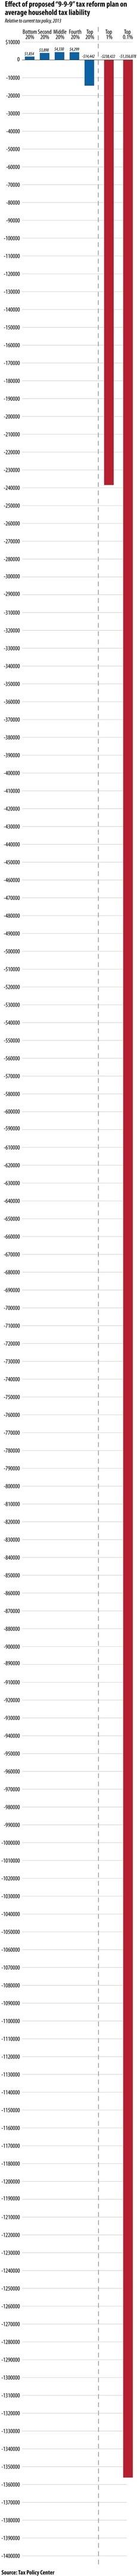 The 9-9-9 plan in one (very long) graph by Ezra Klein, Ezra Klein's Wonk Blog at Washington Post